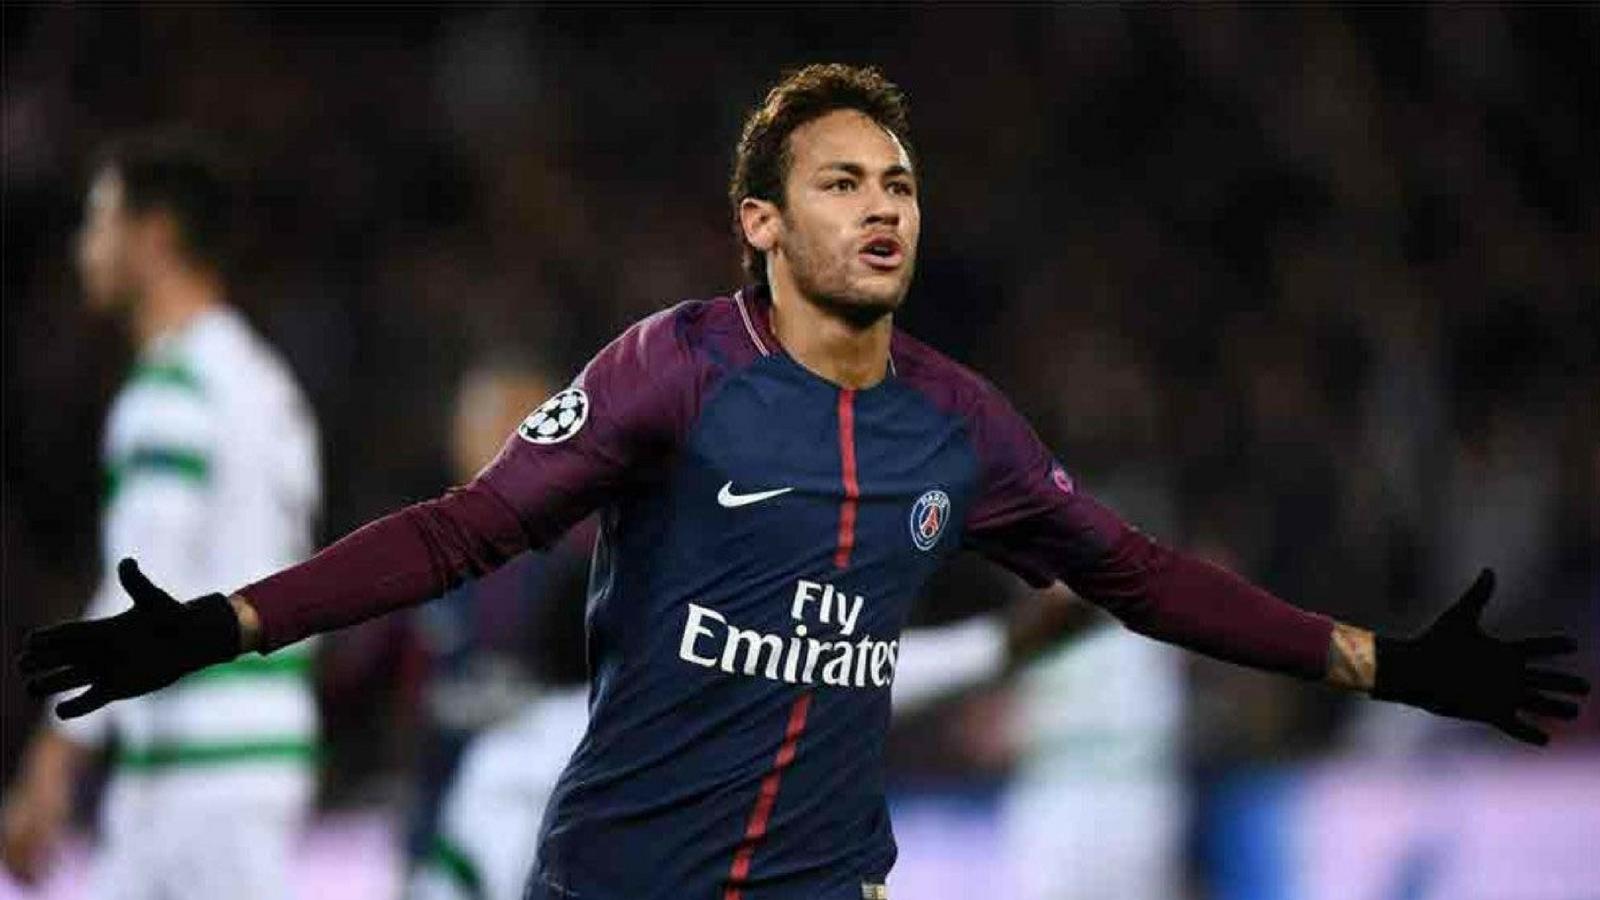 Vídeo: El entrenador que Neymar le ha pedido a Al-Khelaïfi para seguir en el PSG